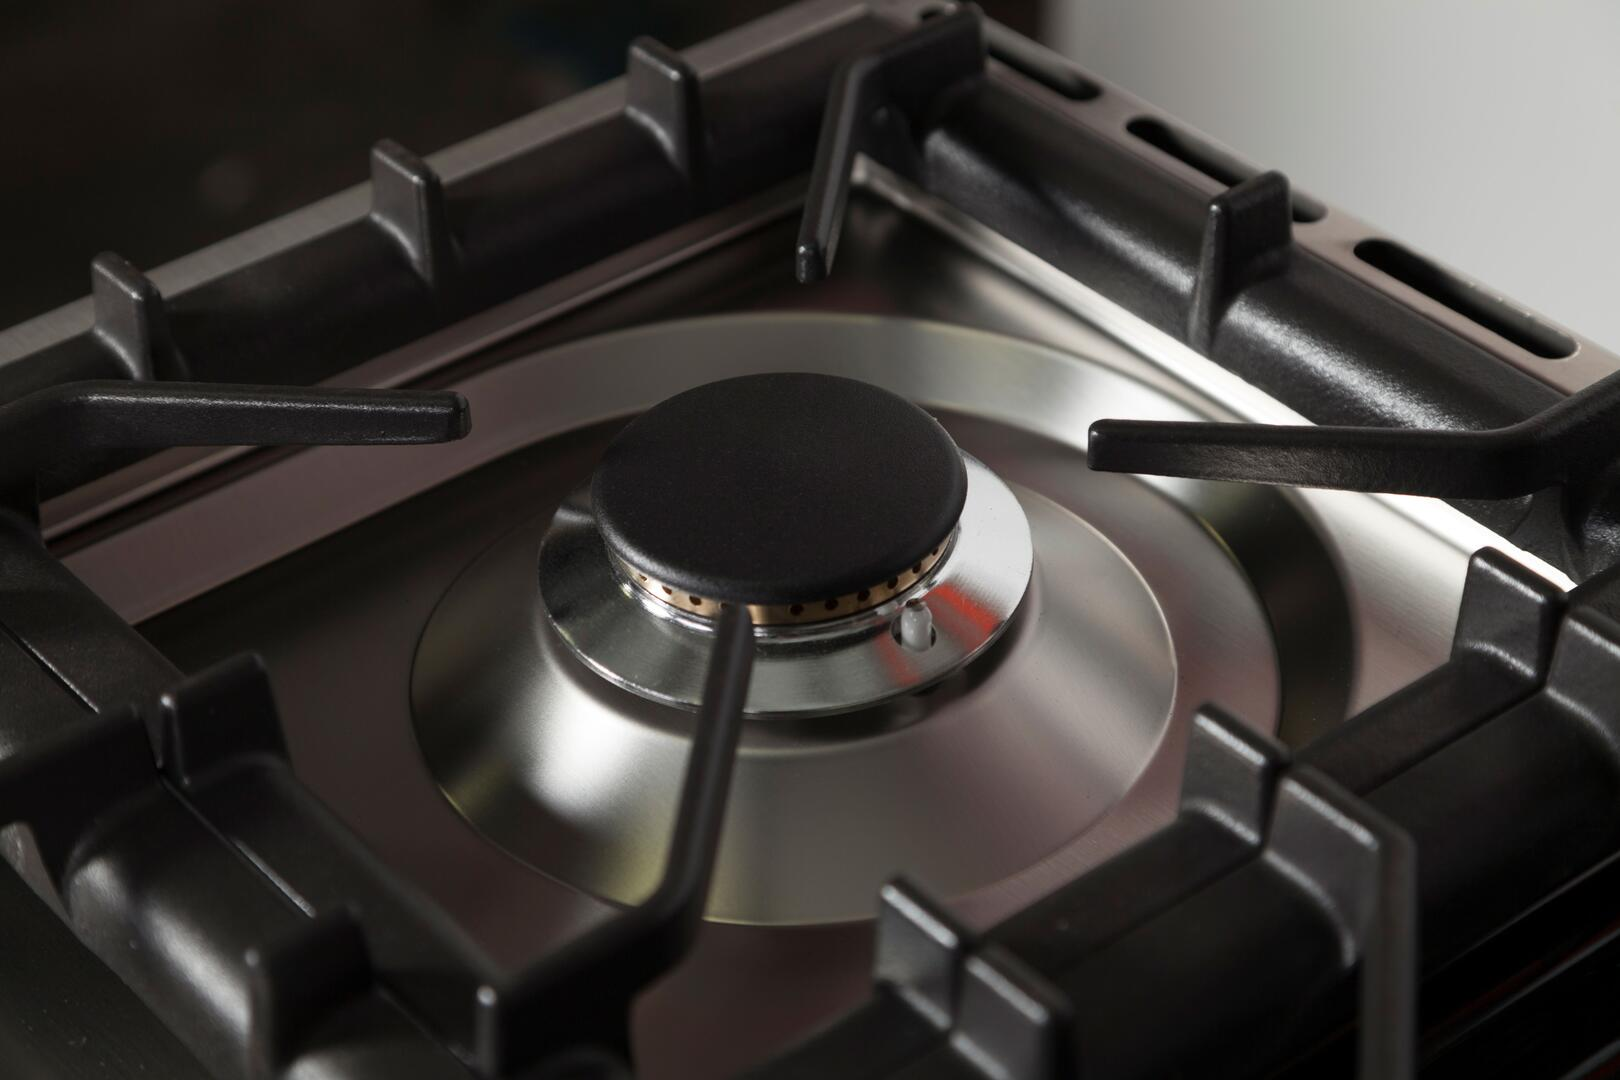 Ilve Professional Plus UPW90FDMPI Freestanding Dual Fuel Range Stainless Steel, Burner Details